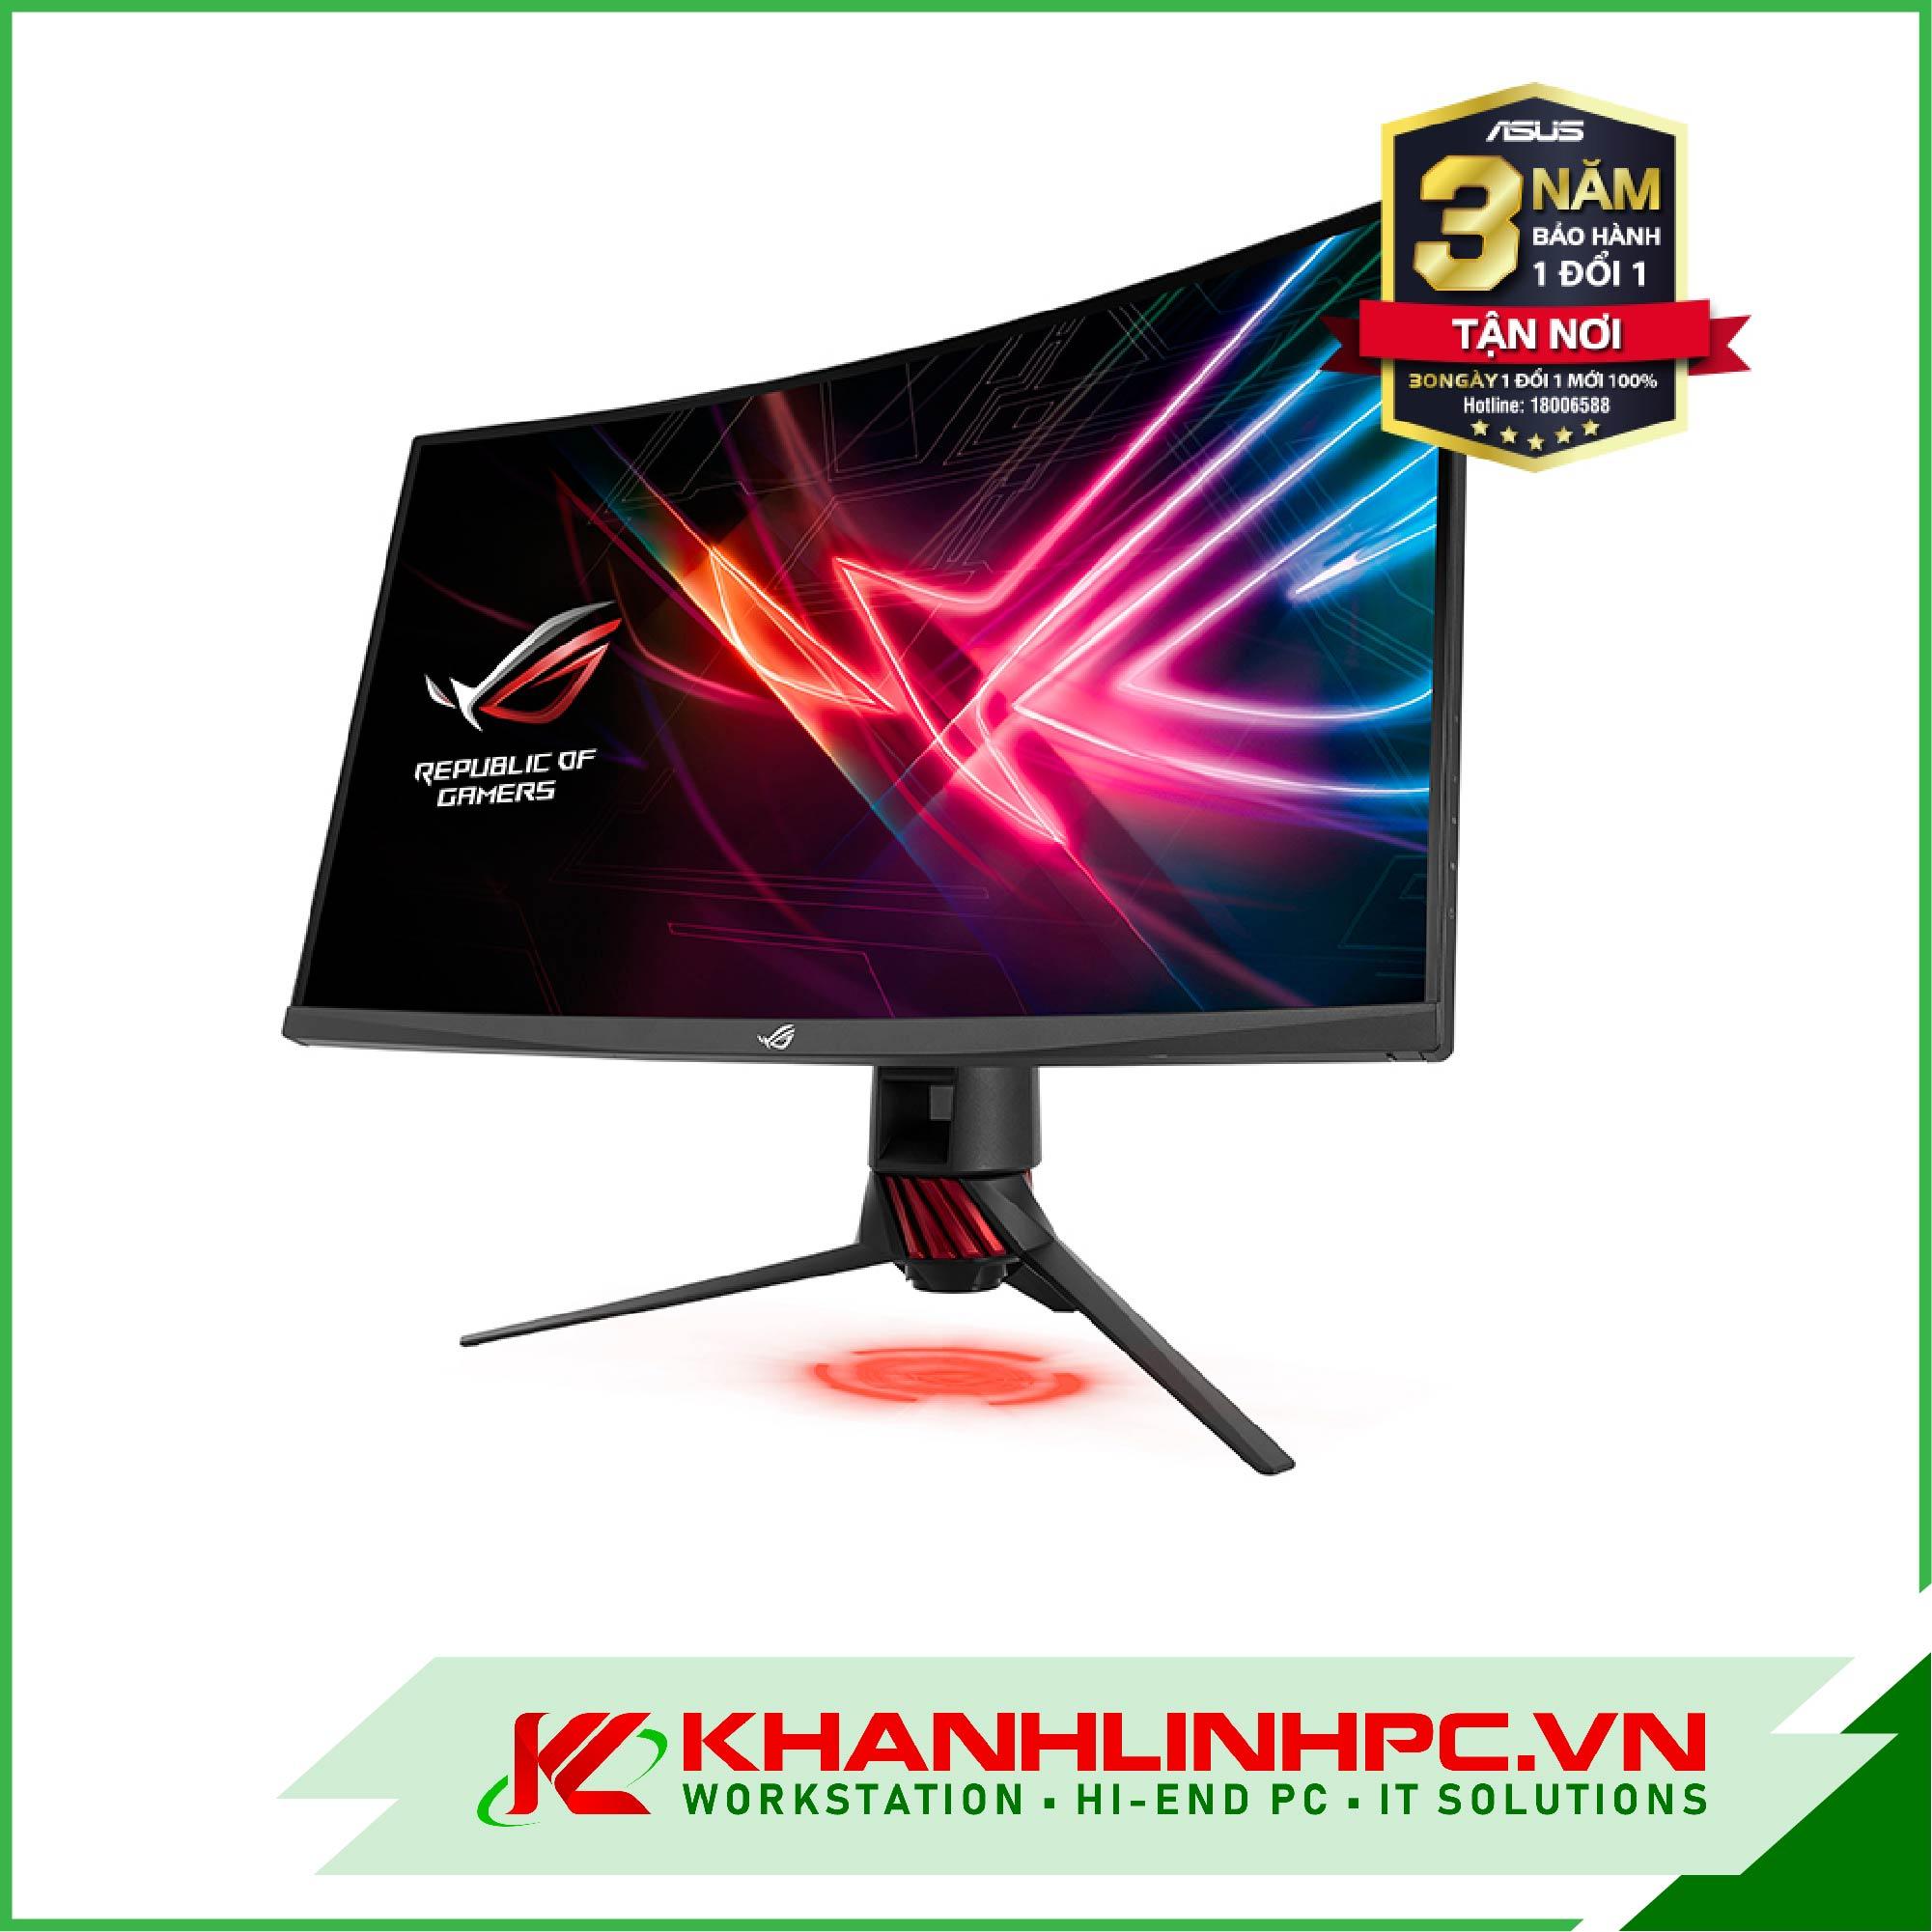 ASUS ROG Strix XG32VQ Curved Gaming Monitor 32 inch WQHD (2560x1440) 144Hz